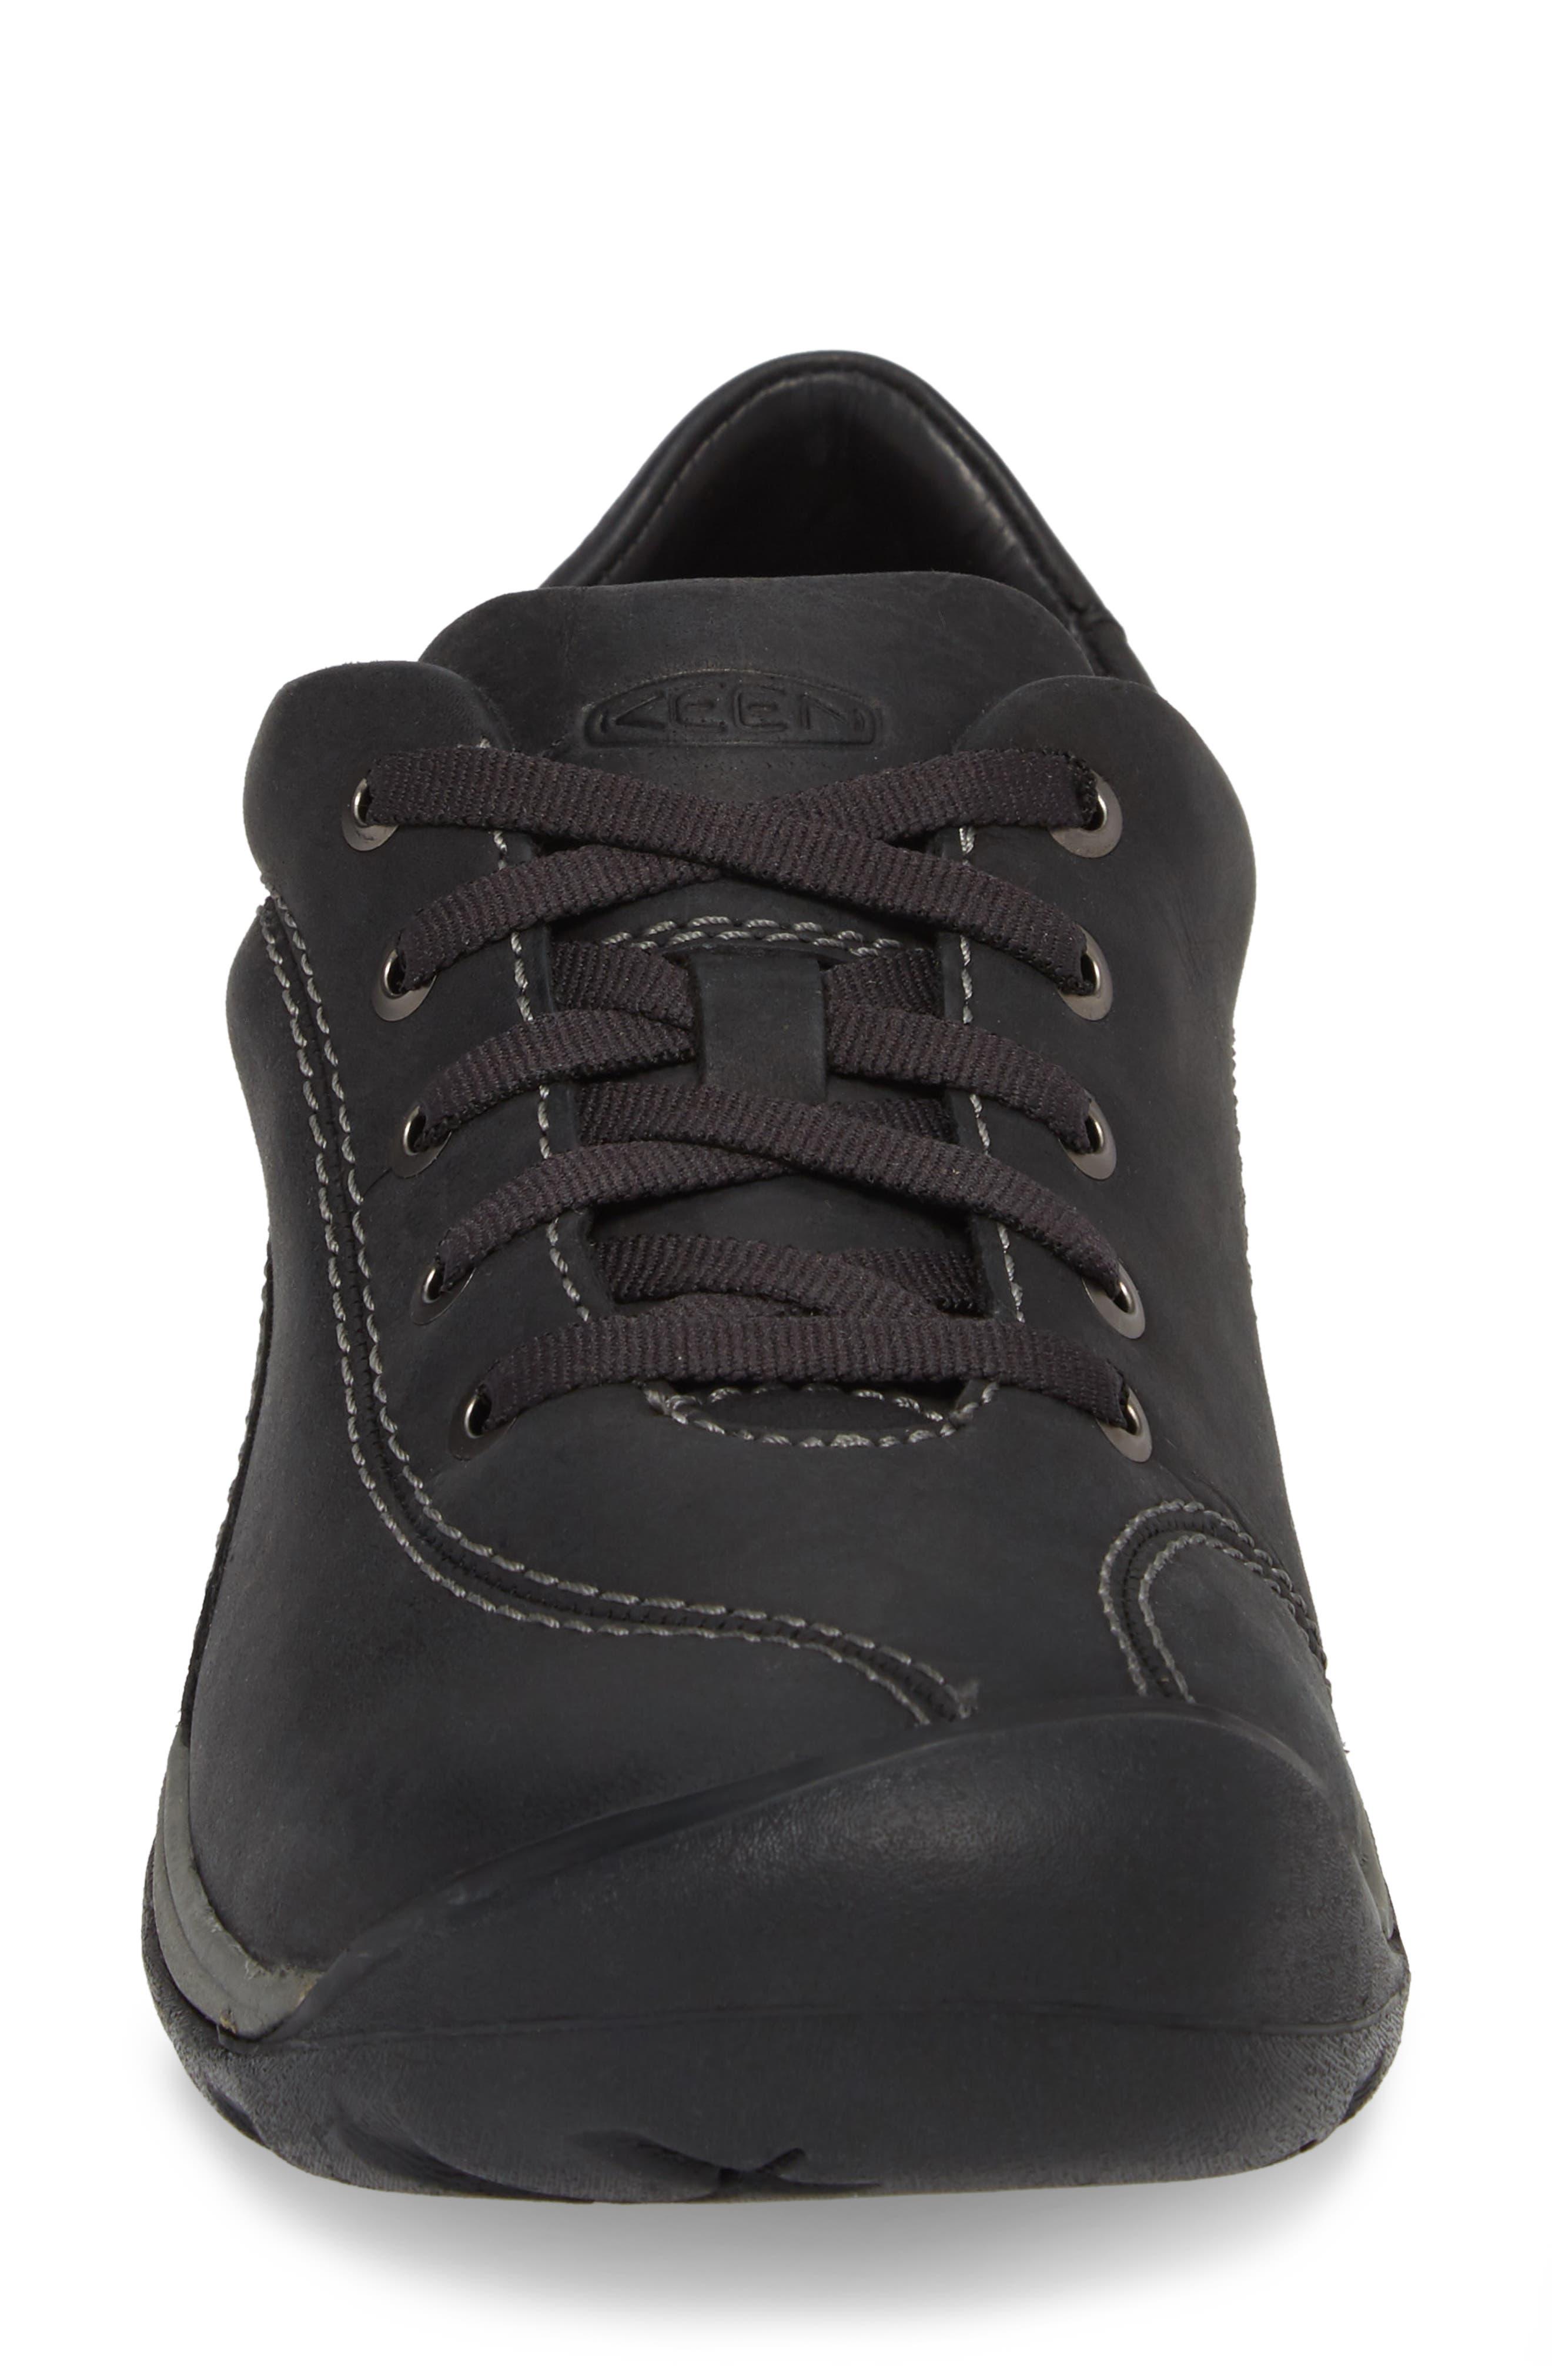 Presidio II Sneaker,                             Alternate thumbnail 4, color,                             BLACK/ STEEL GREY LEATHER